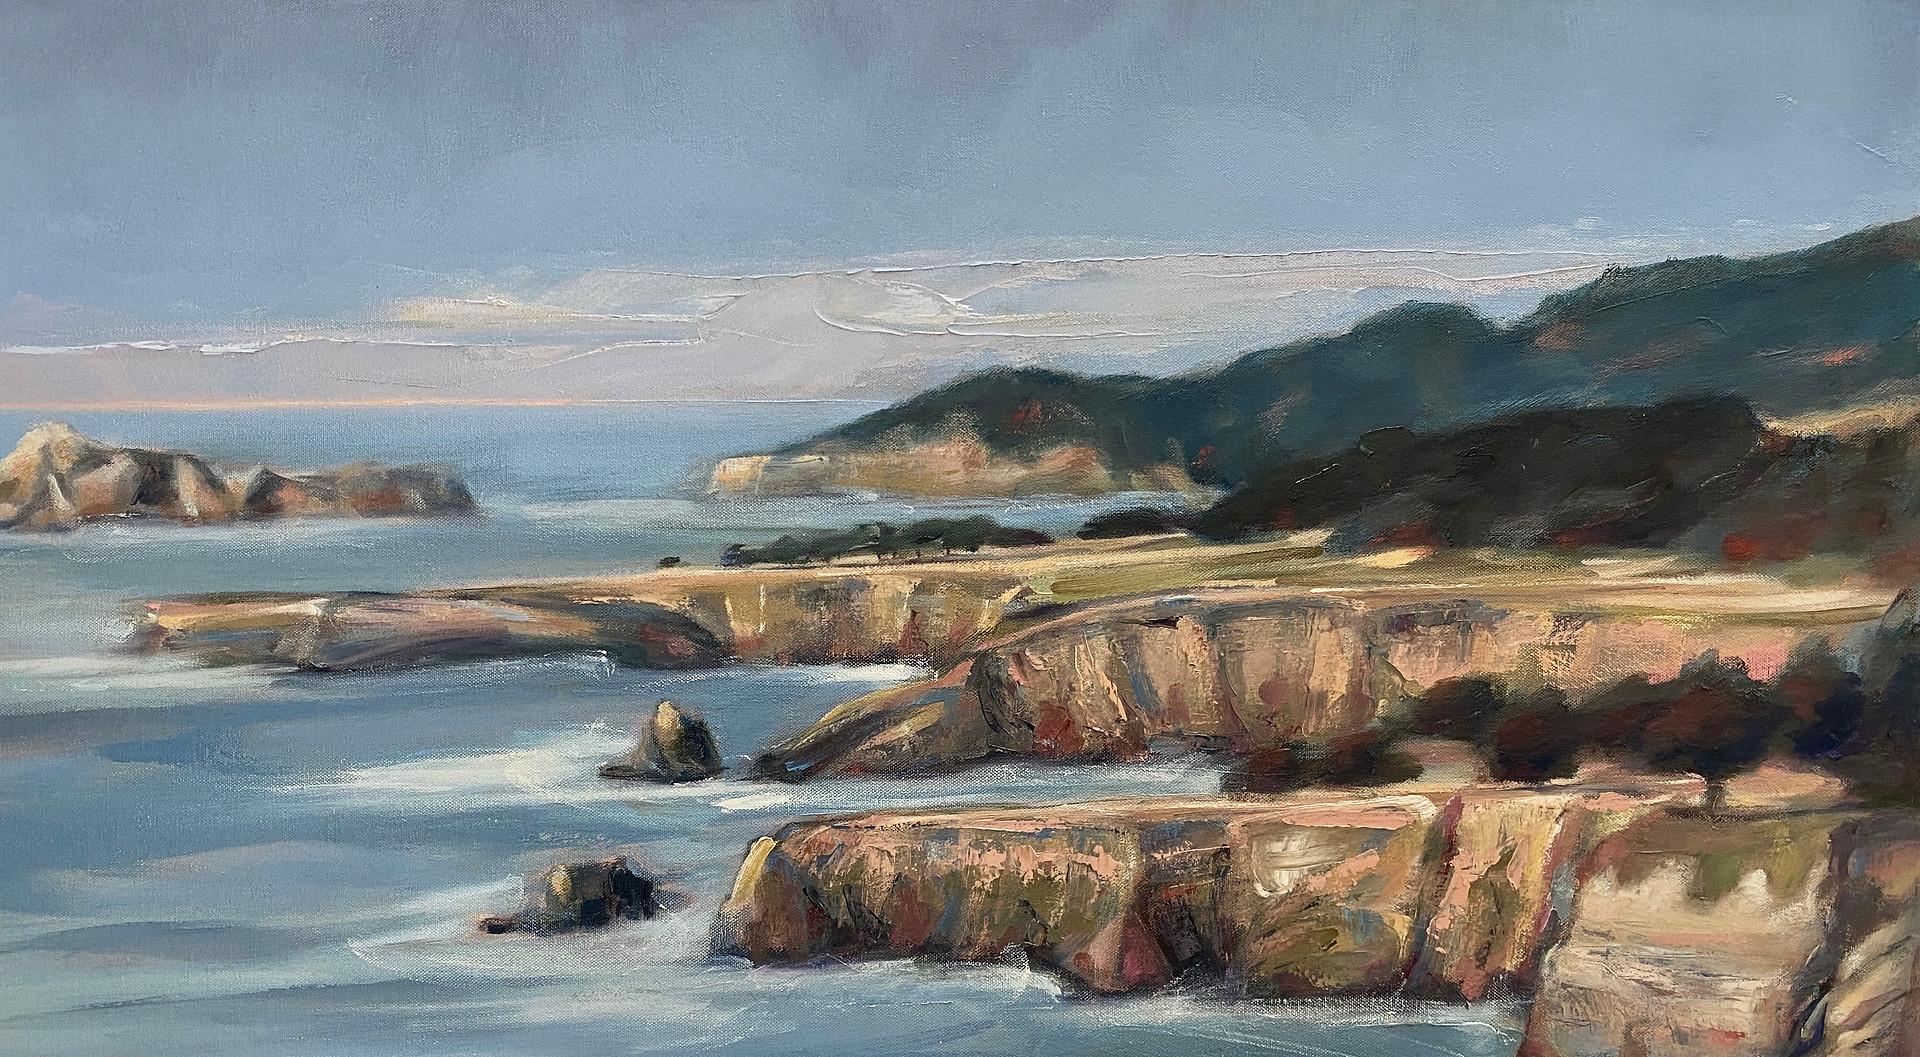 24 x 36 Oil on canvas $750